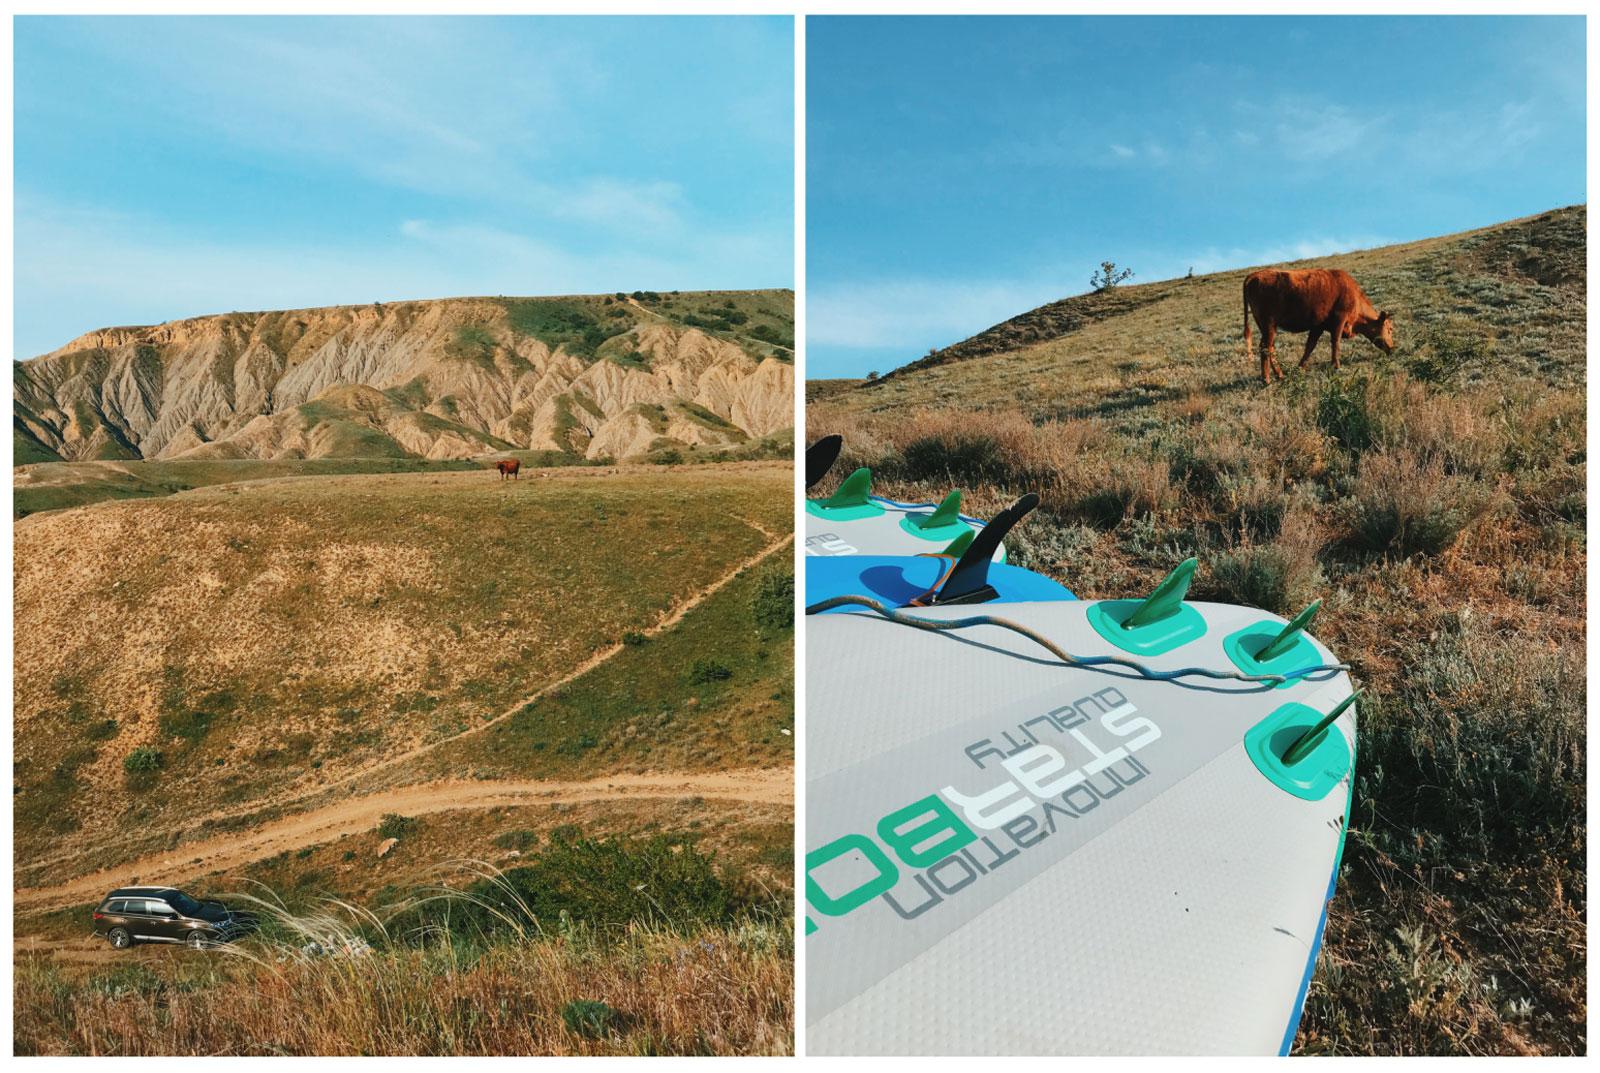 julia-karpacheva-paddleboarding-russia-black-sea-cows-in-the-countryside